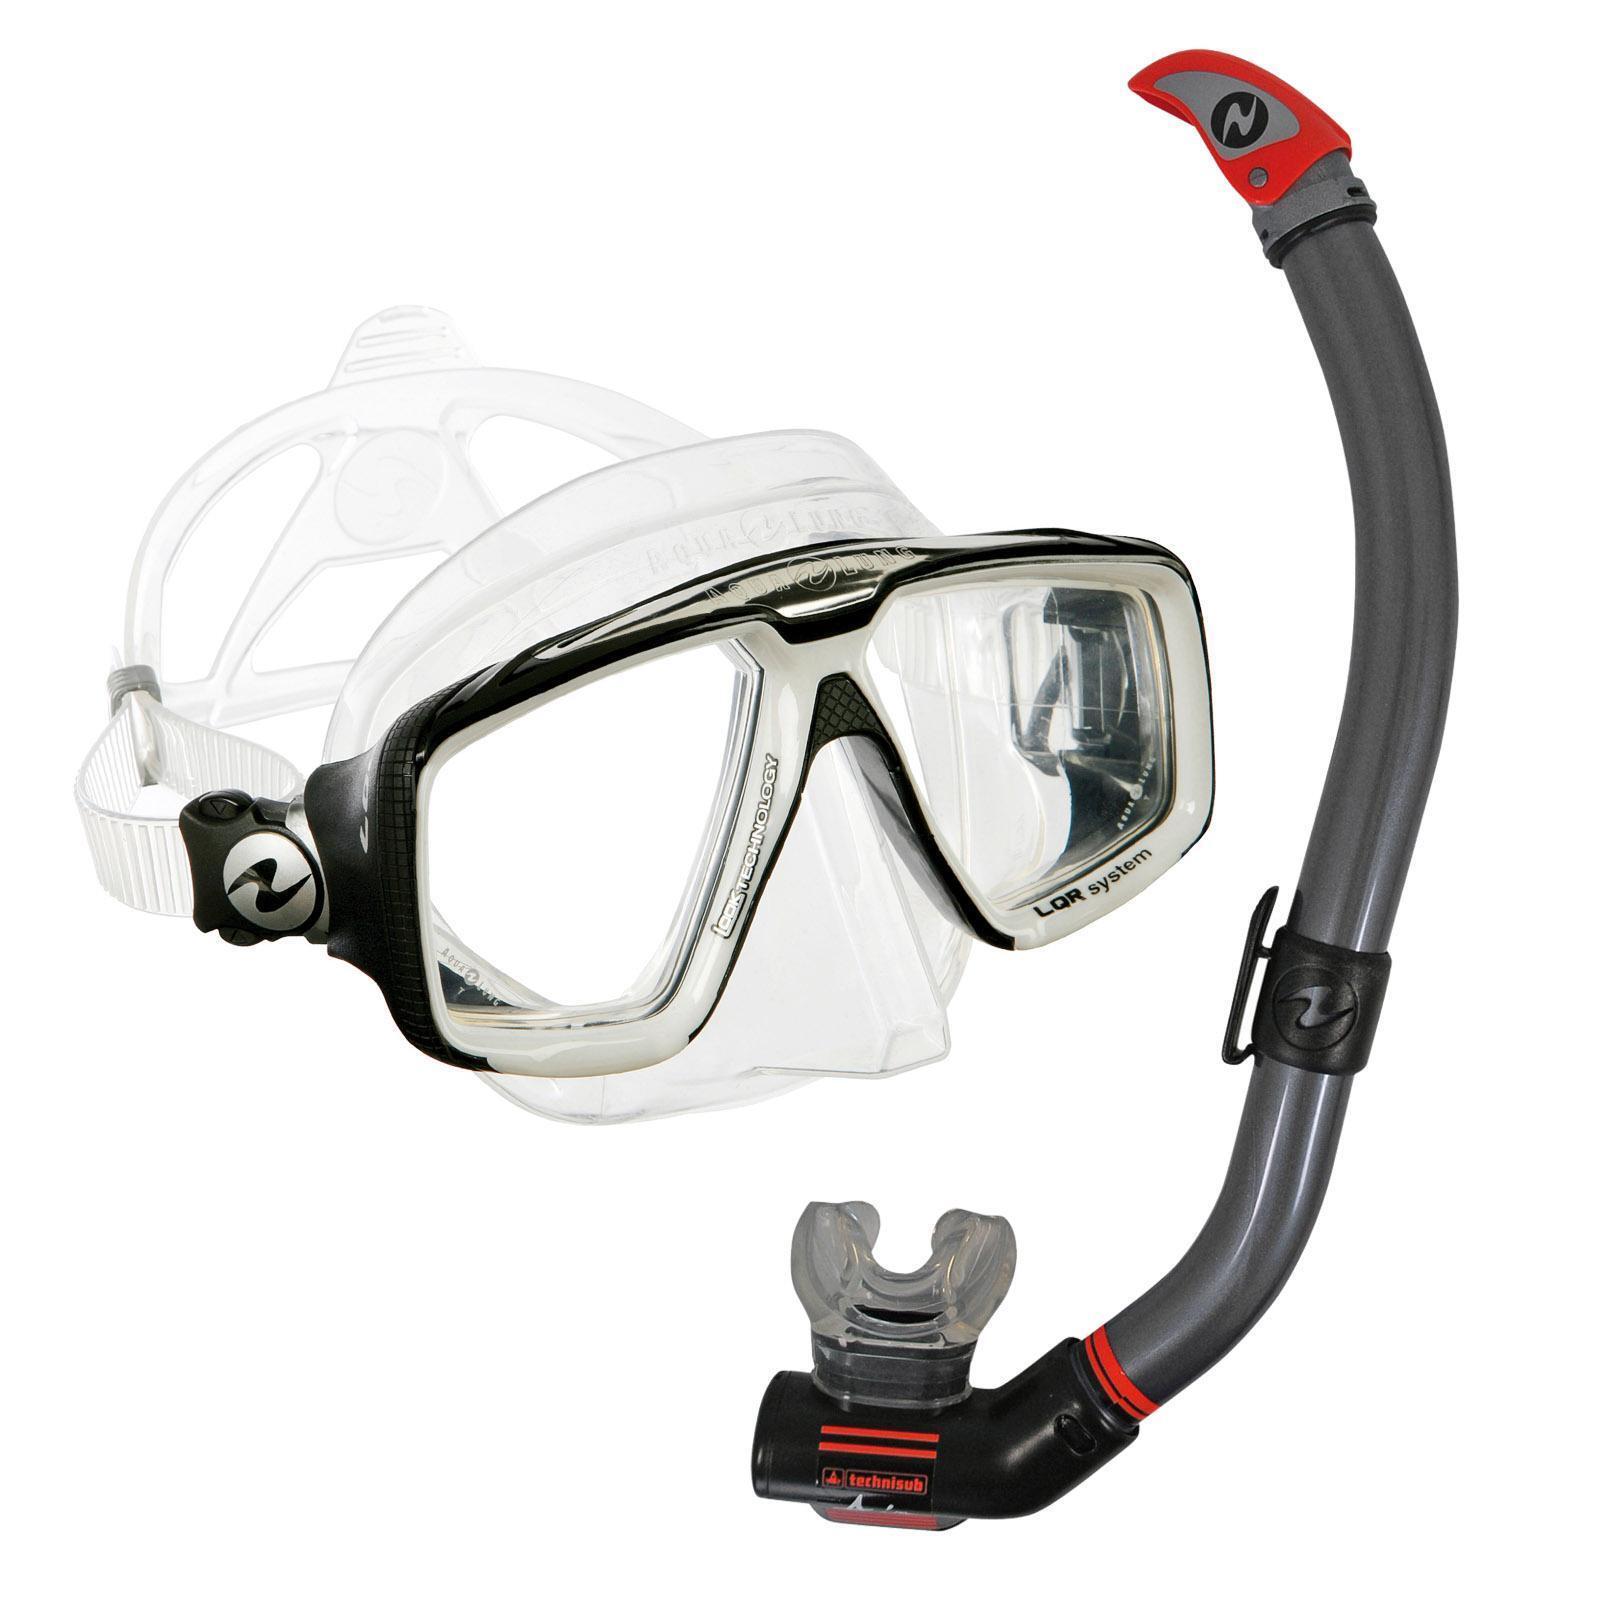 AquaLung Schnorchelset Comfort – Maske Maske Maske Look HD mit Schnorchel Air Ventil 9520be